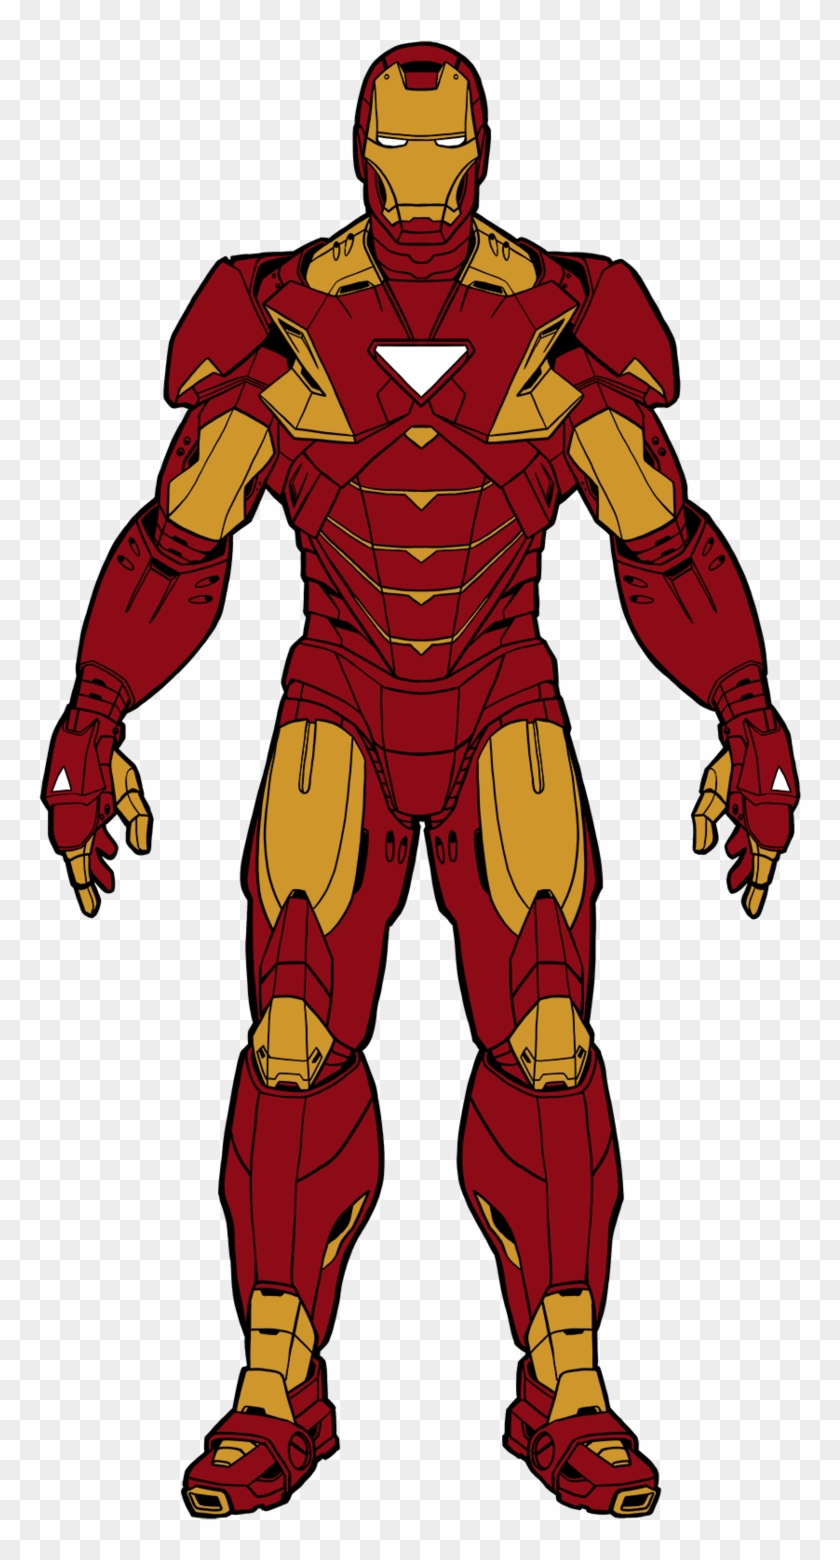 Iron Man Cartoon Drawing Color Avengers Iron Man Toy Free